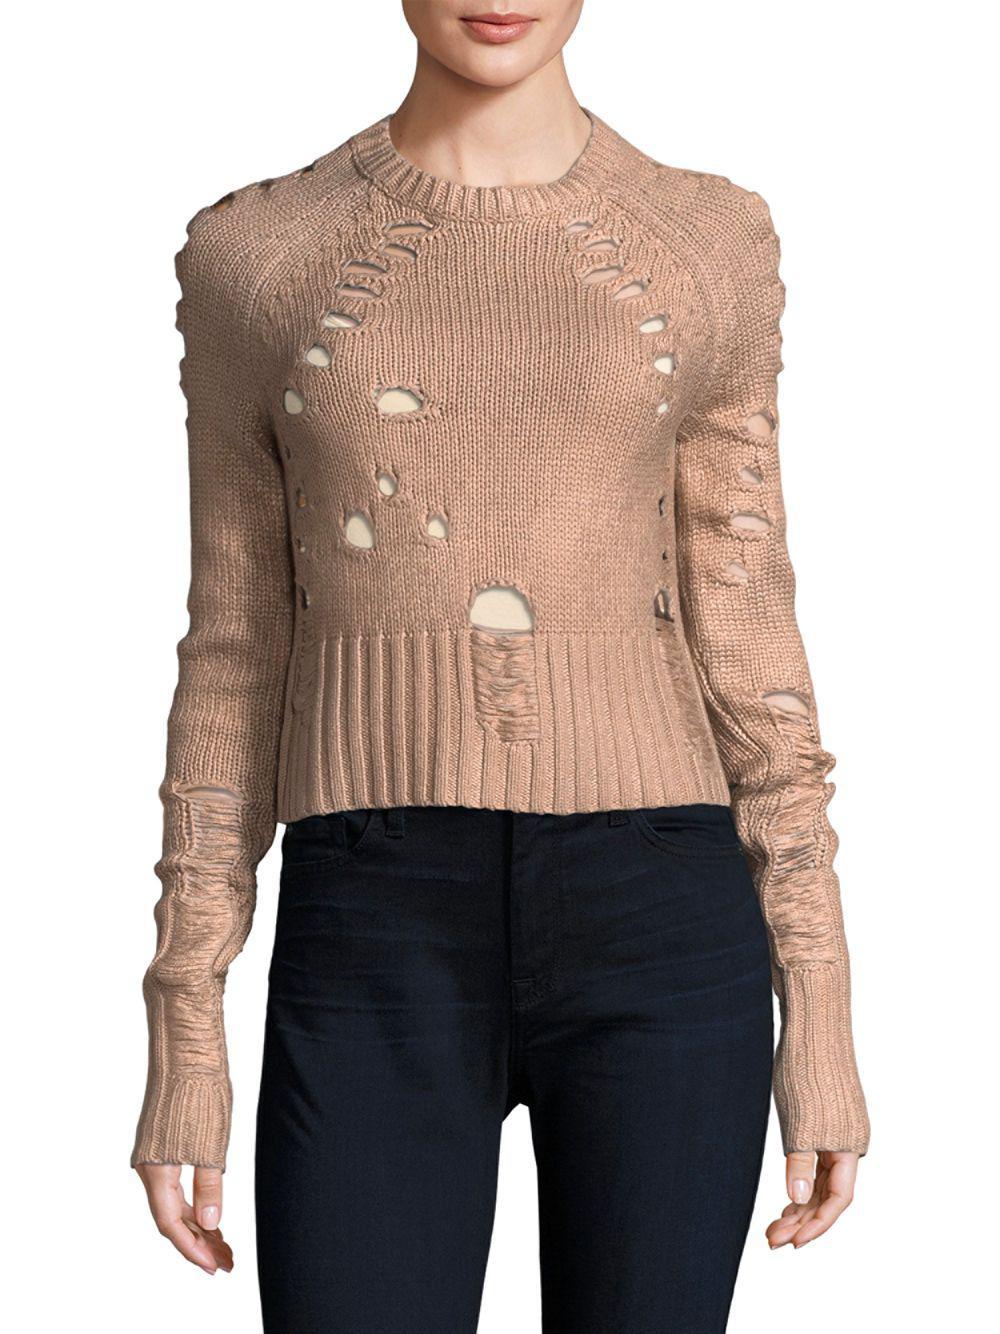 00fb3f6264c1 Zoe Jordan - Multicolor Distressed Foil Wool And Cashmere Sweater - Lyst.  View fullscreen